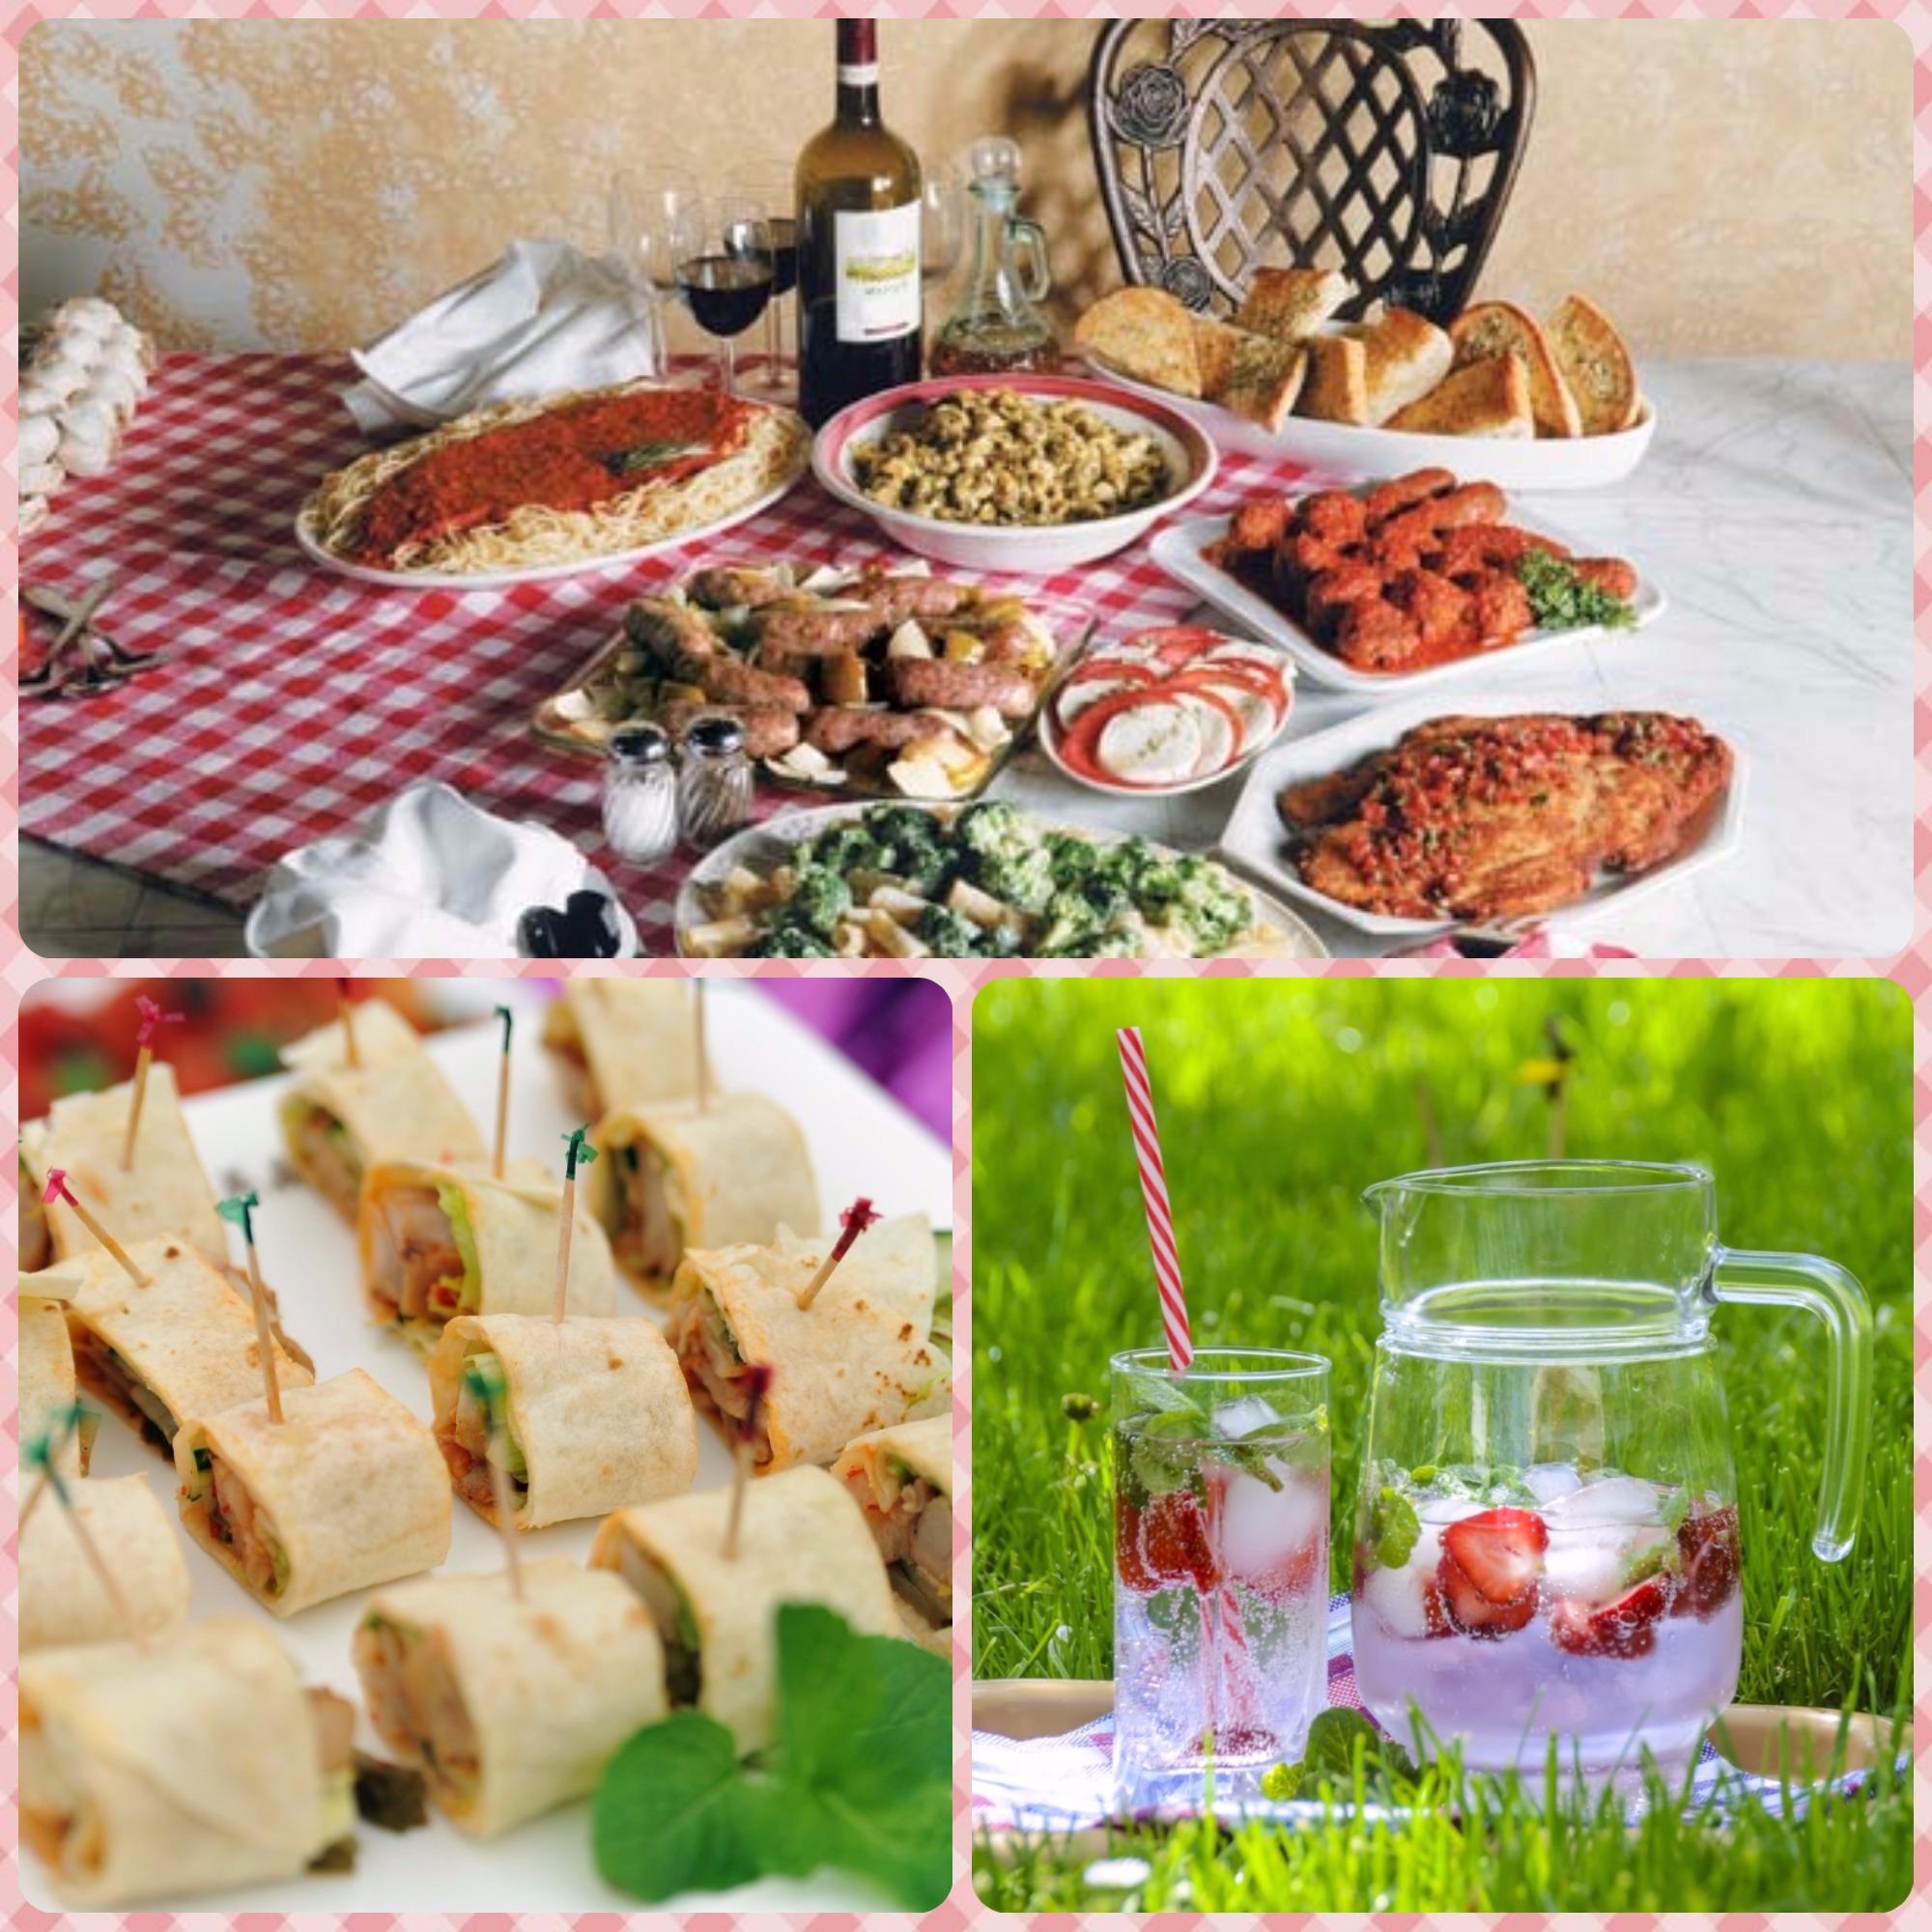 picnicfood0001.jpg